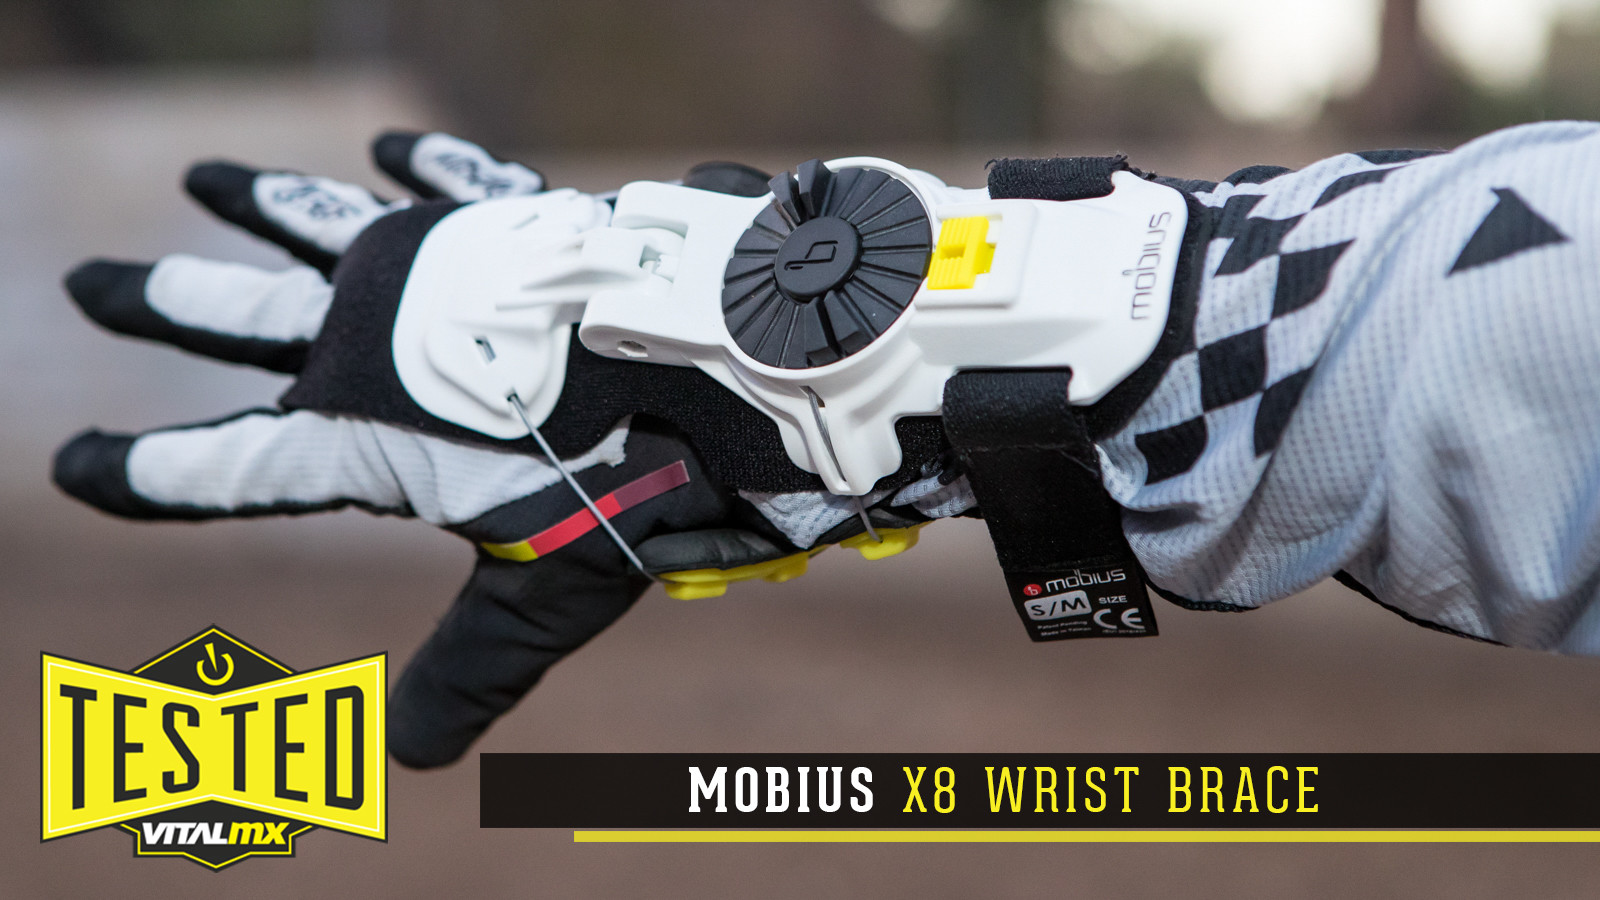 Tested: Mobius X8 Wrist Brace